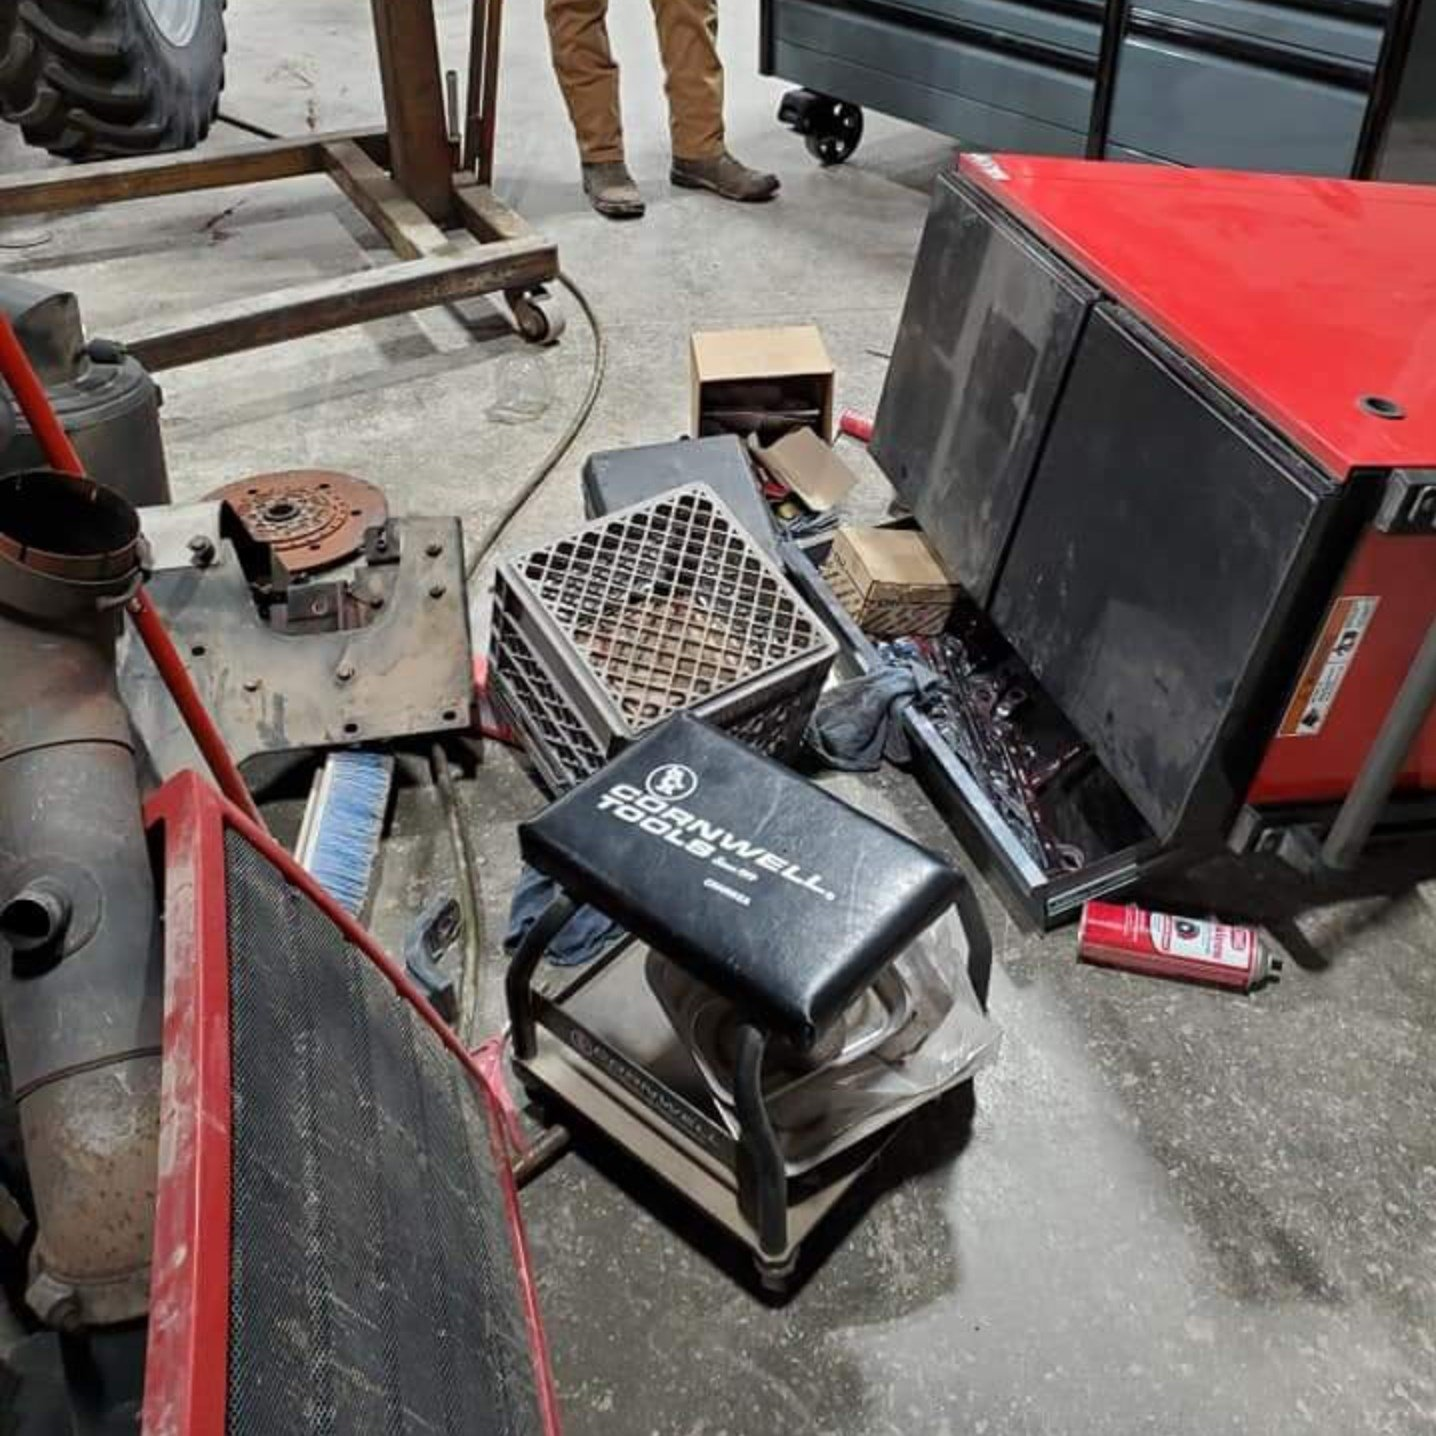 Tools stolen from farm equipment center